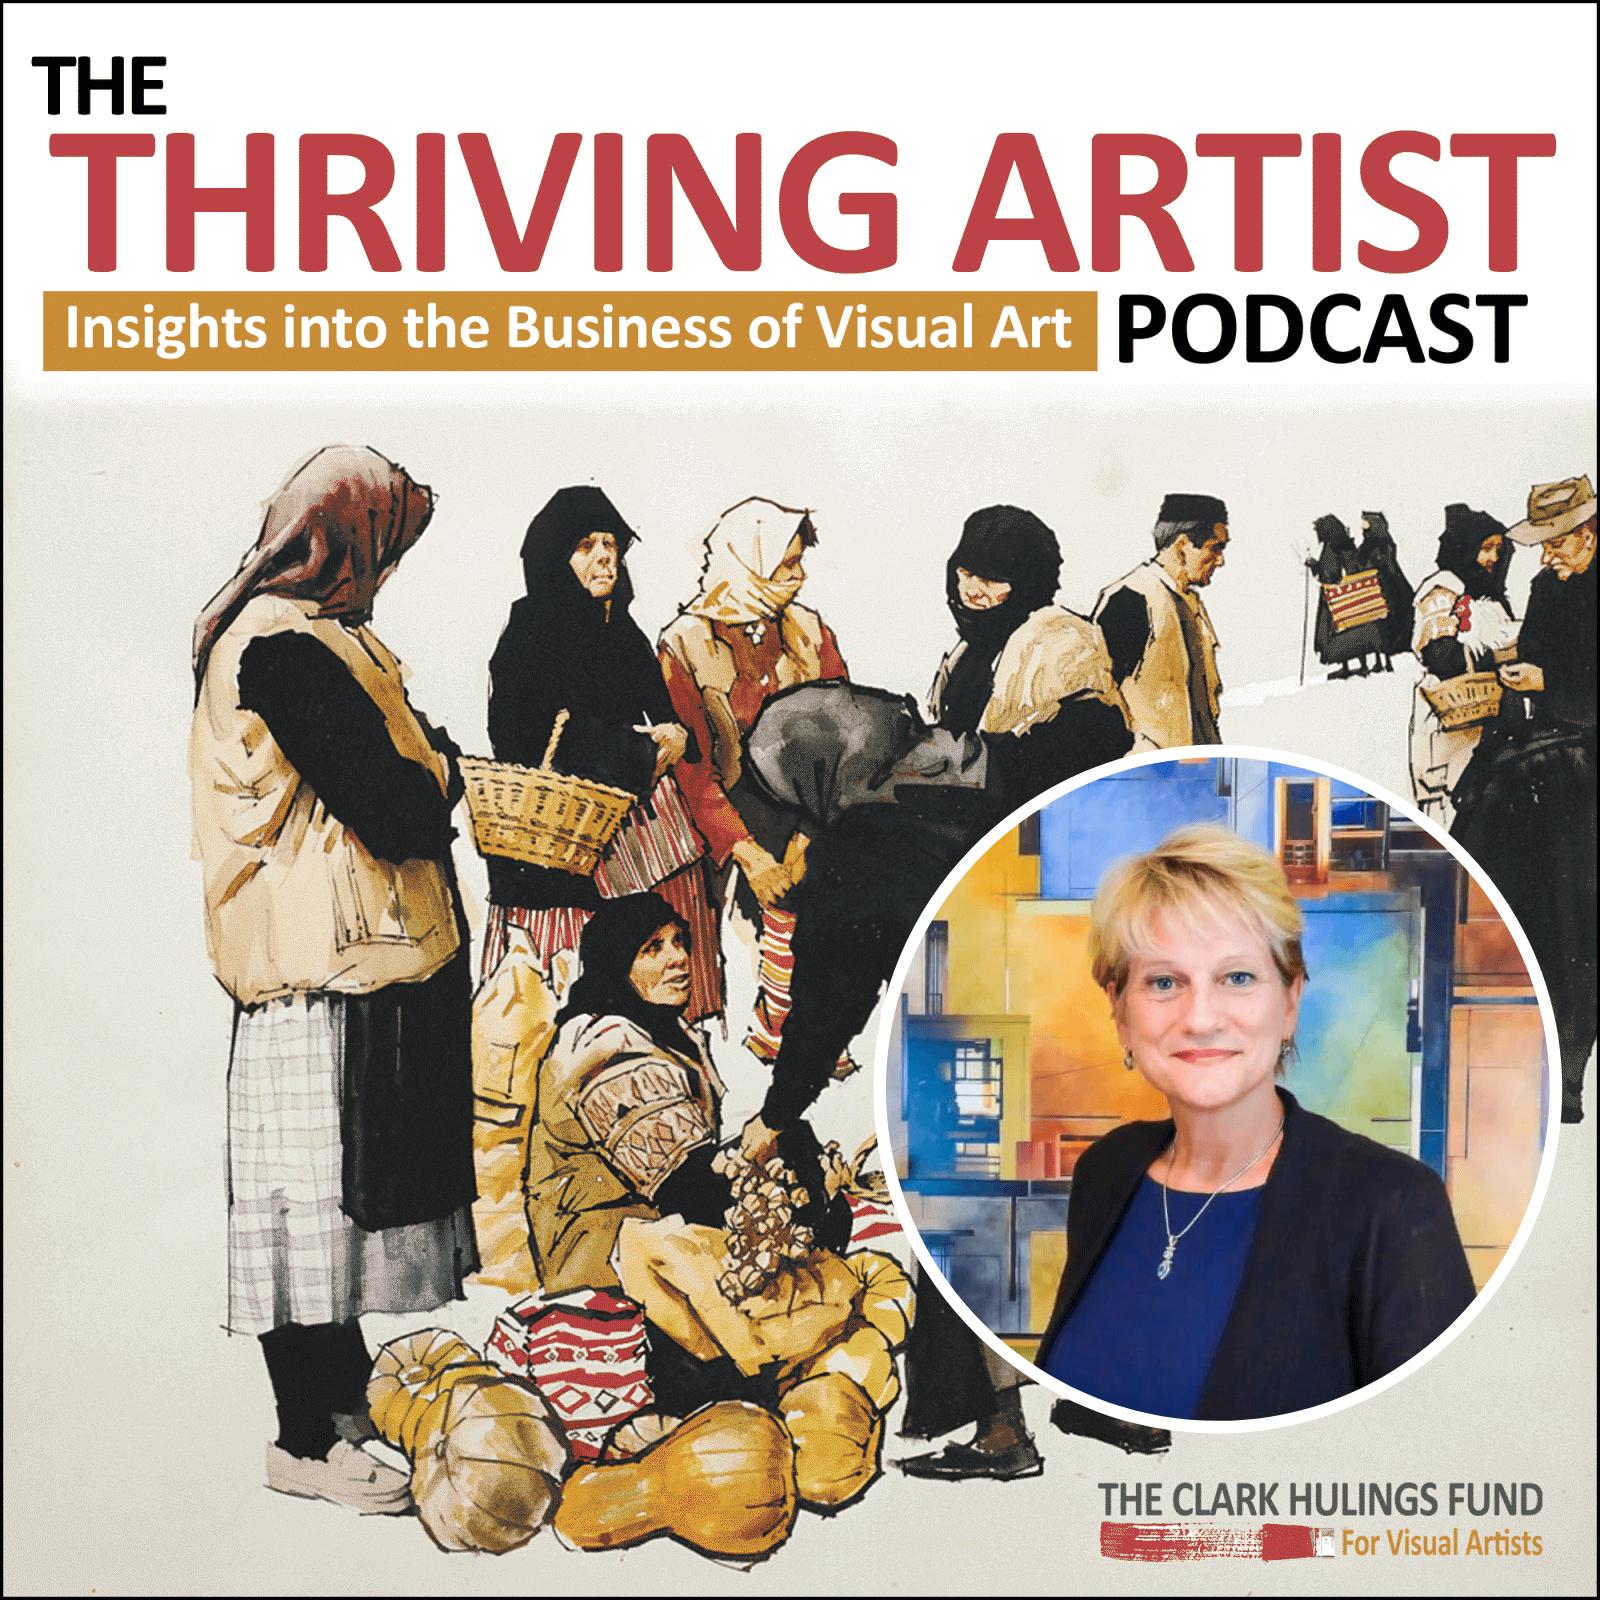 Artwork for podcast The Thriving Artist